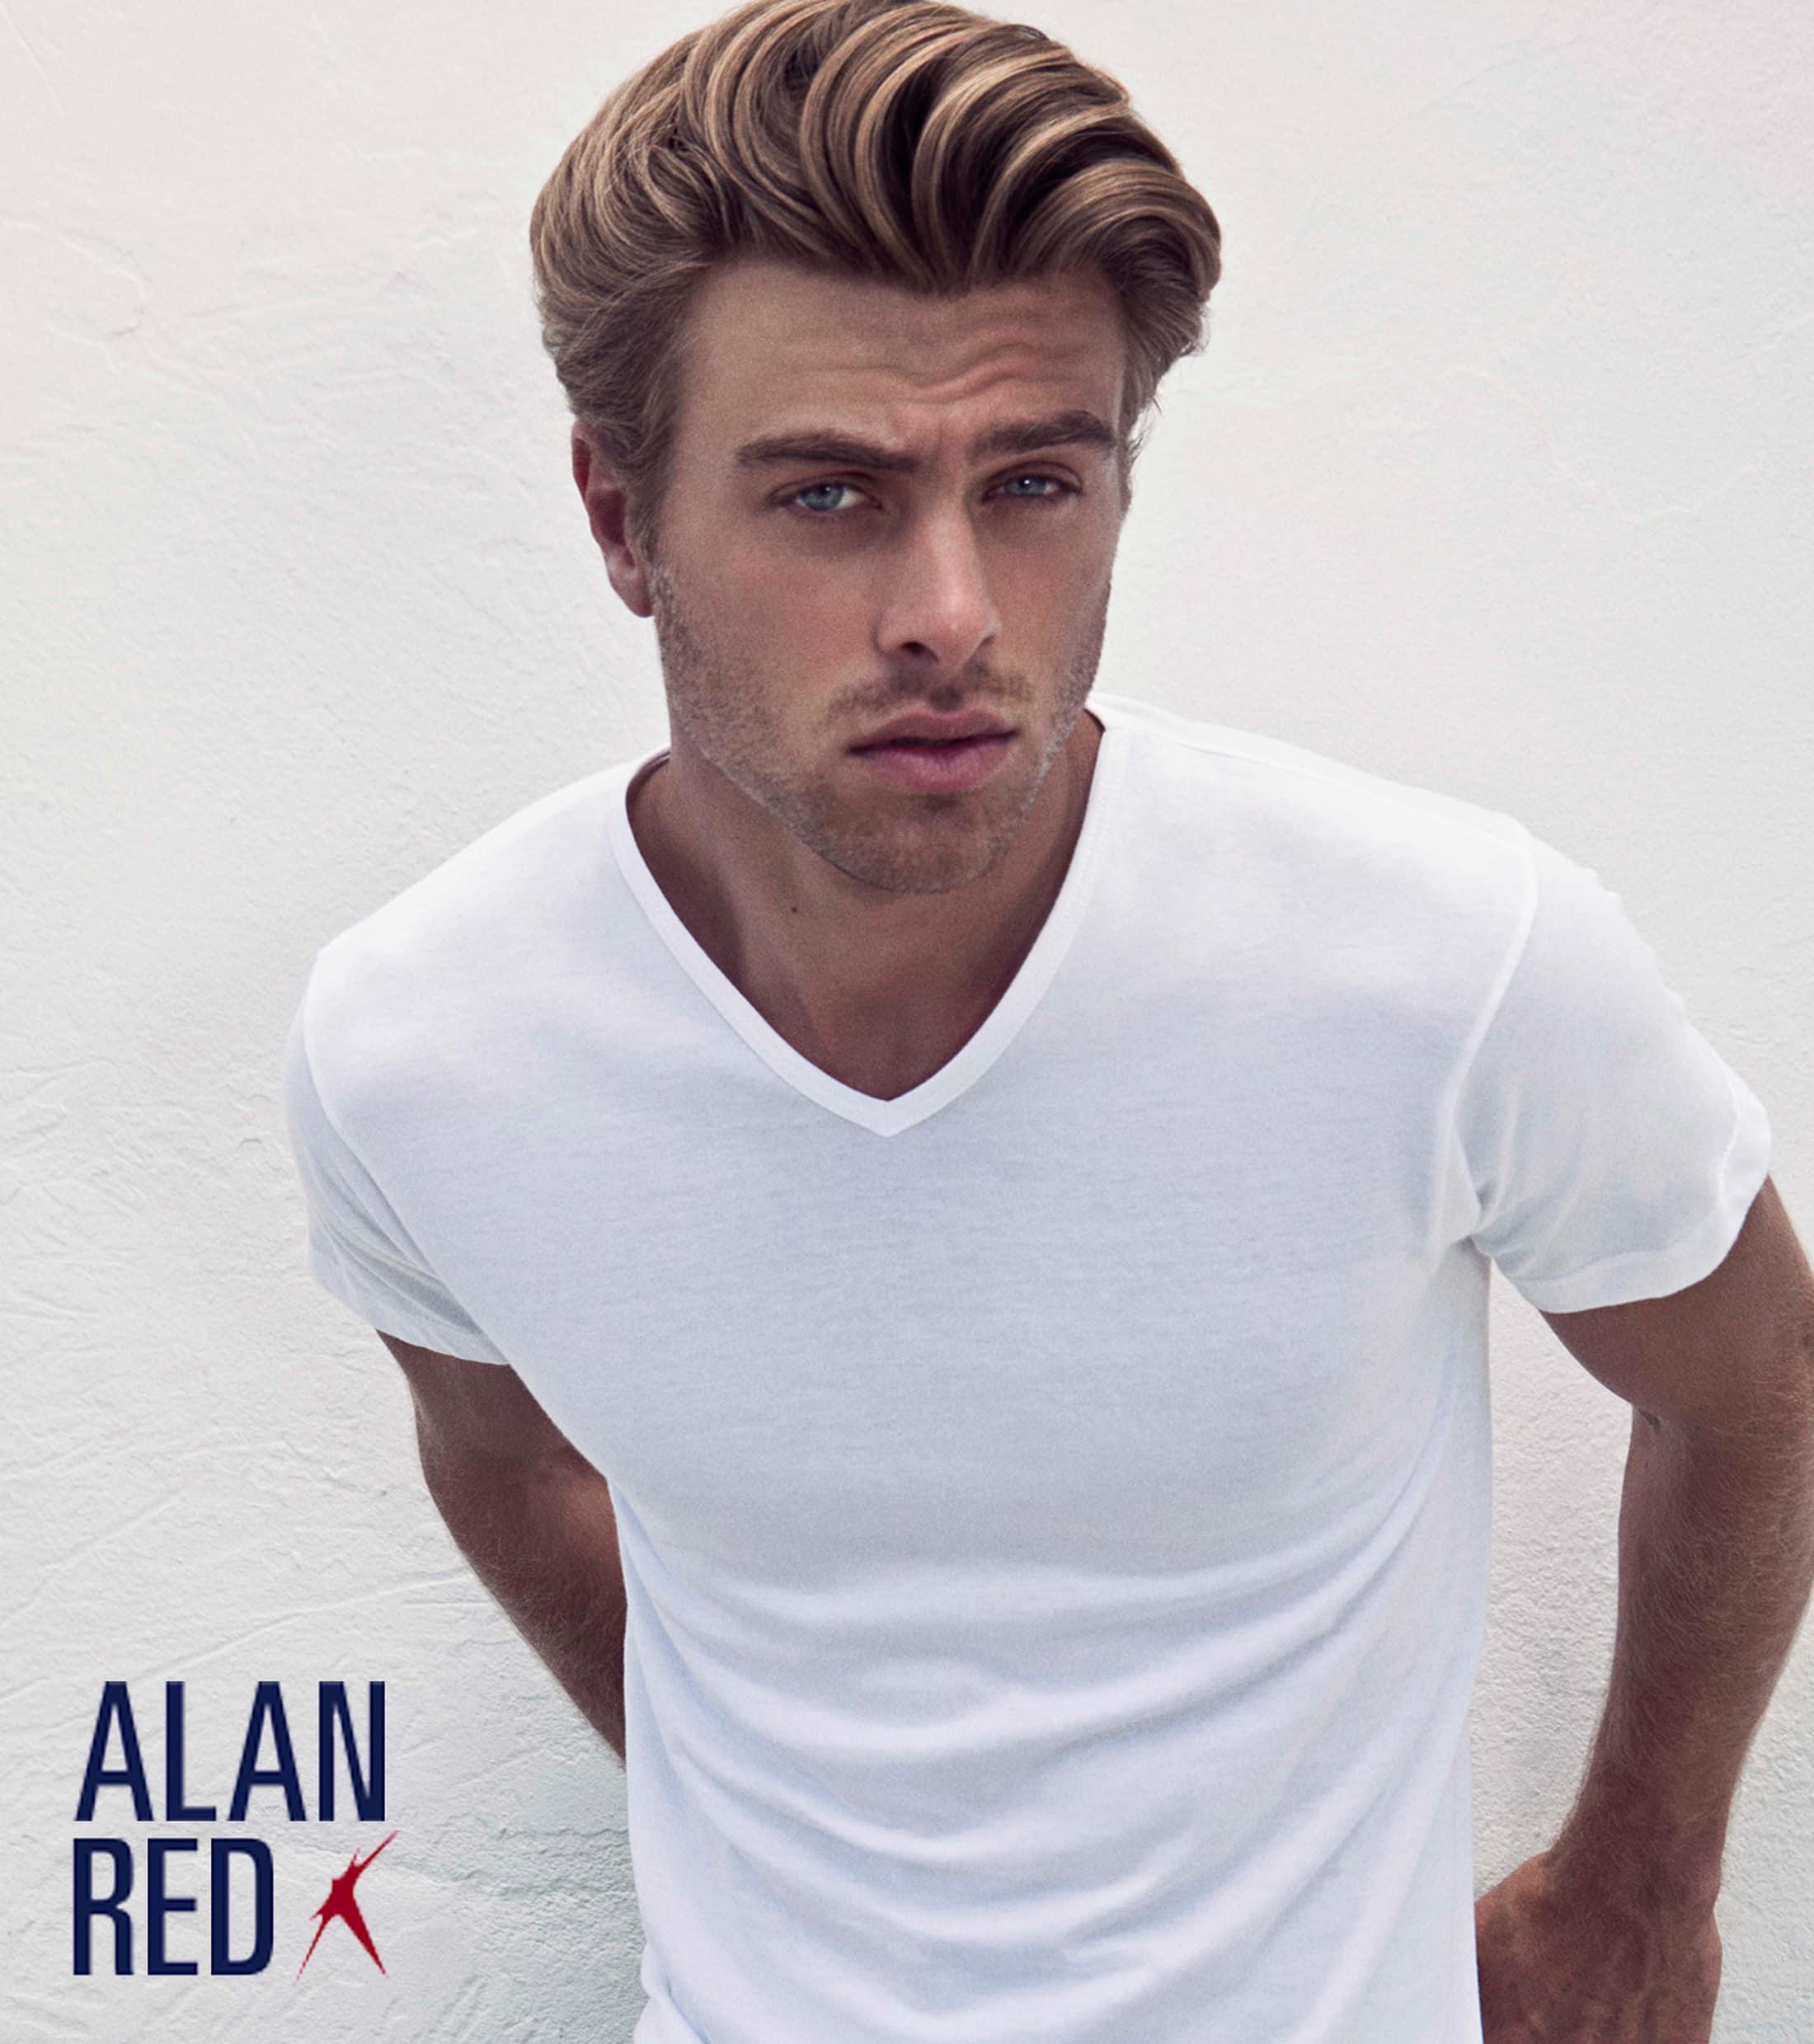 Alan Red Vermont T-shirt V-Neck Dark Grey 1-Pack foto 3